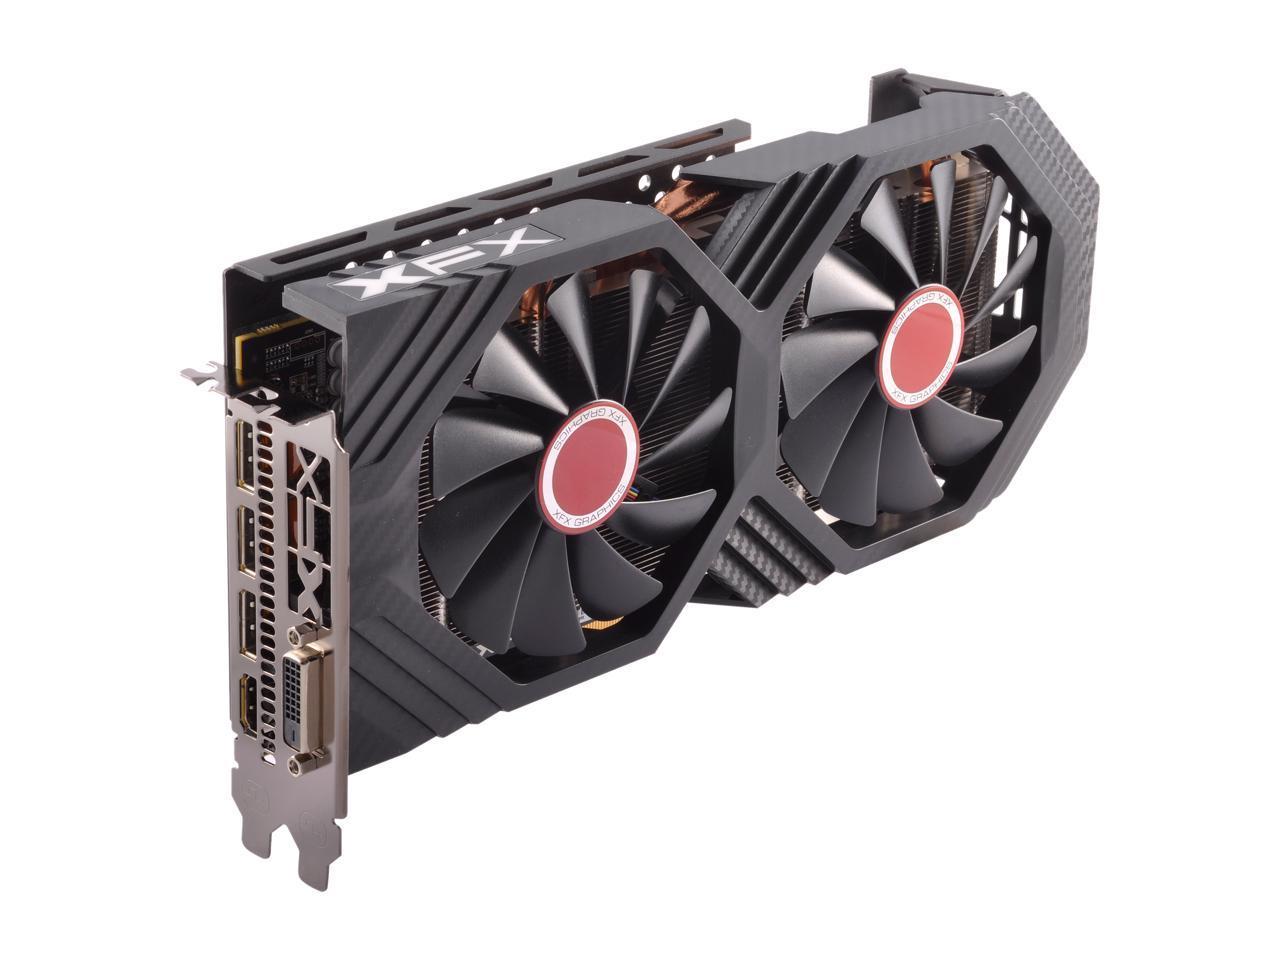 Details about XFX Radeon RX 580 GTS Black Edition 1405 MHz OC+, 8GB 256-bit  GDDR5, DX12 VR Rea